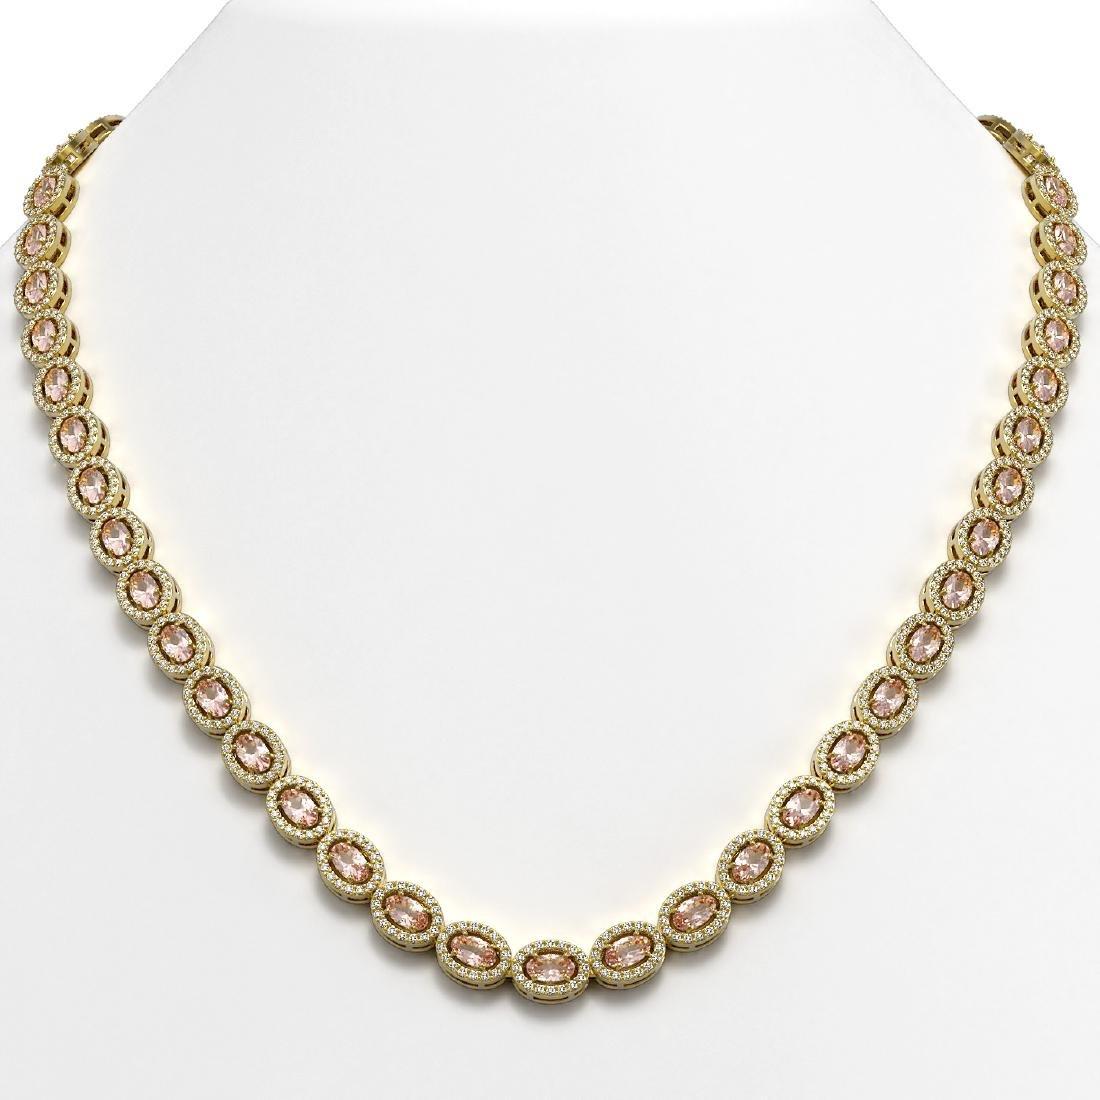 23.48 CTW Morganite & Diamond Halo Necklace 10K Yellow